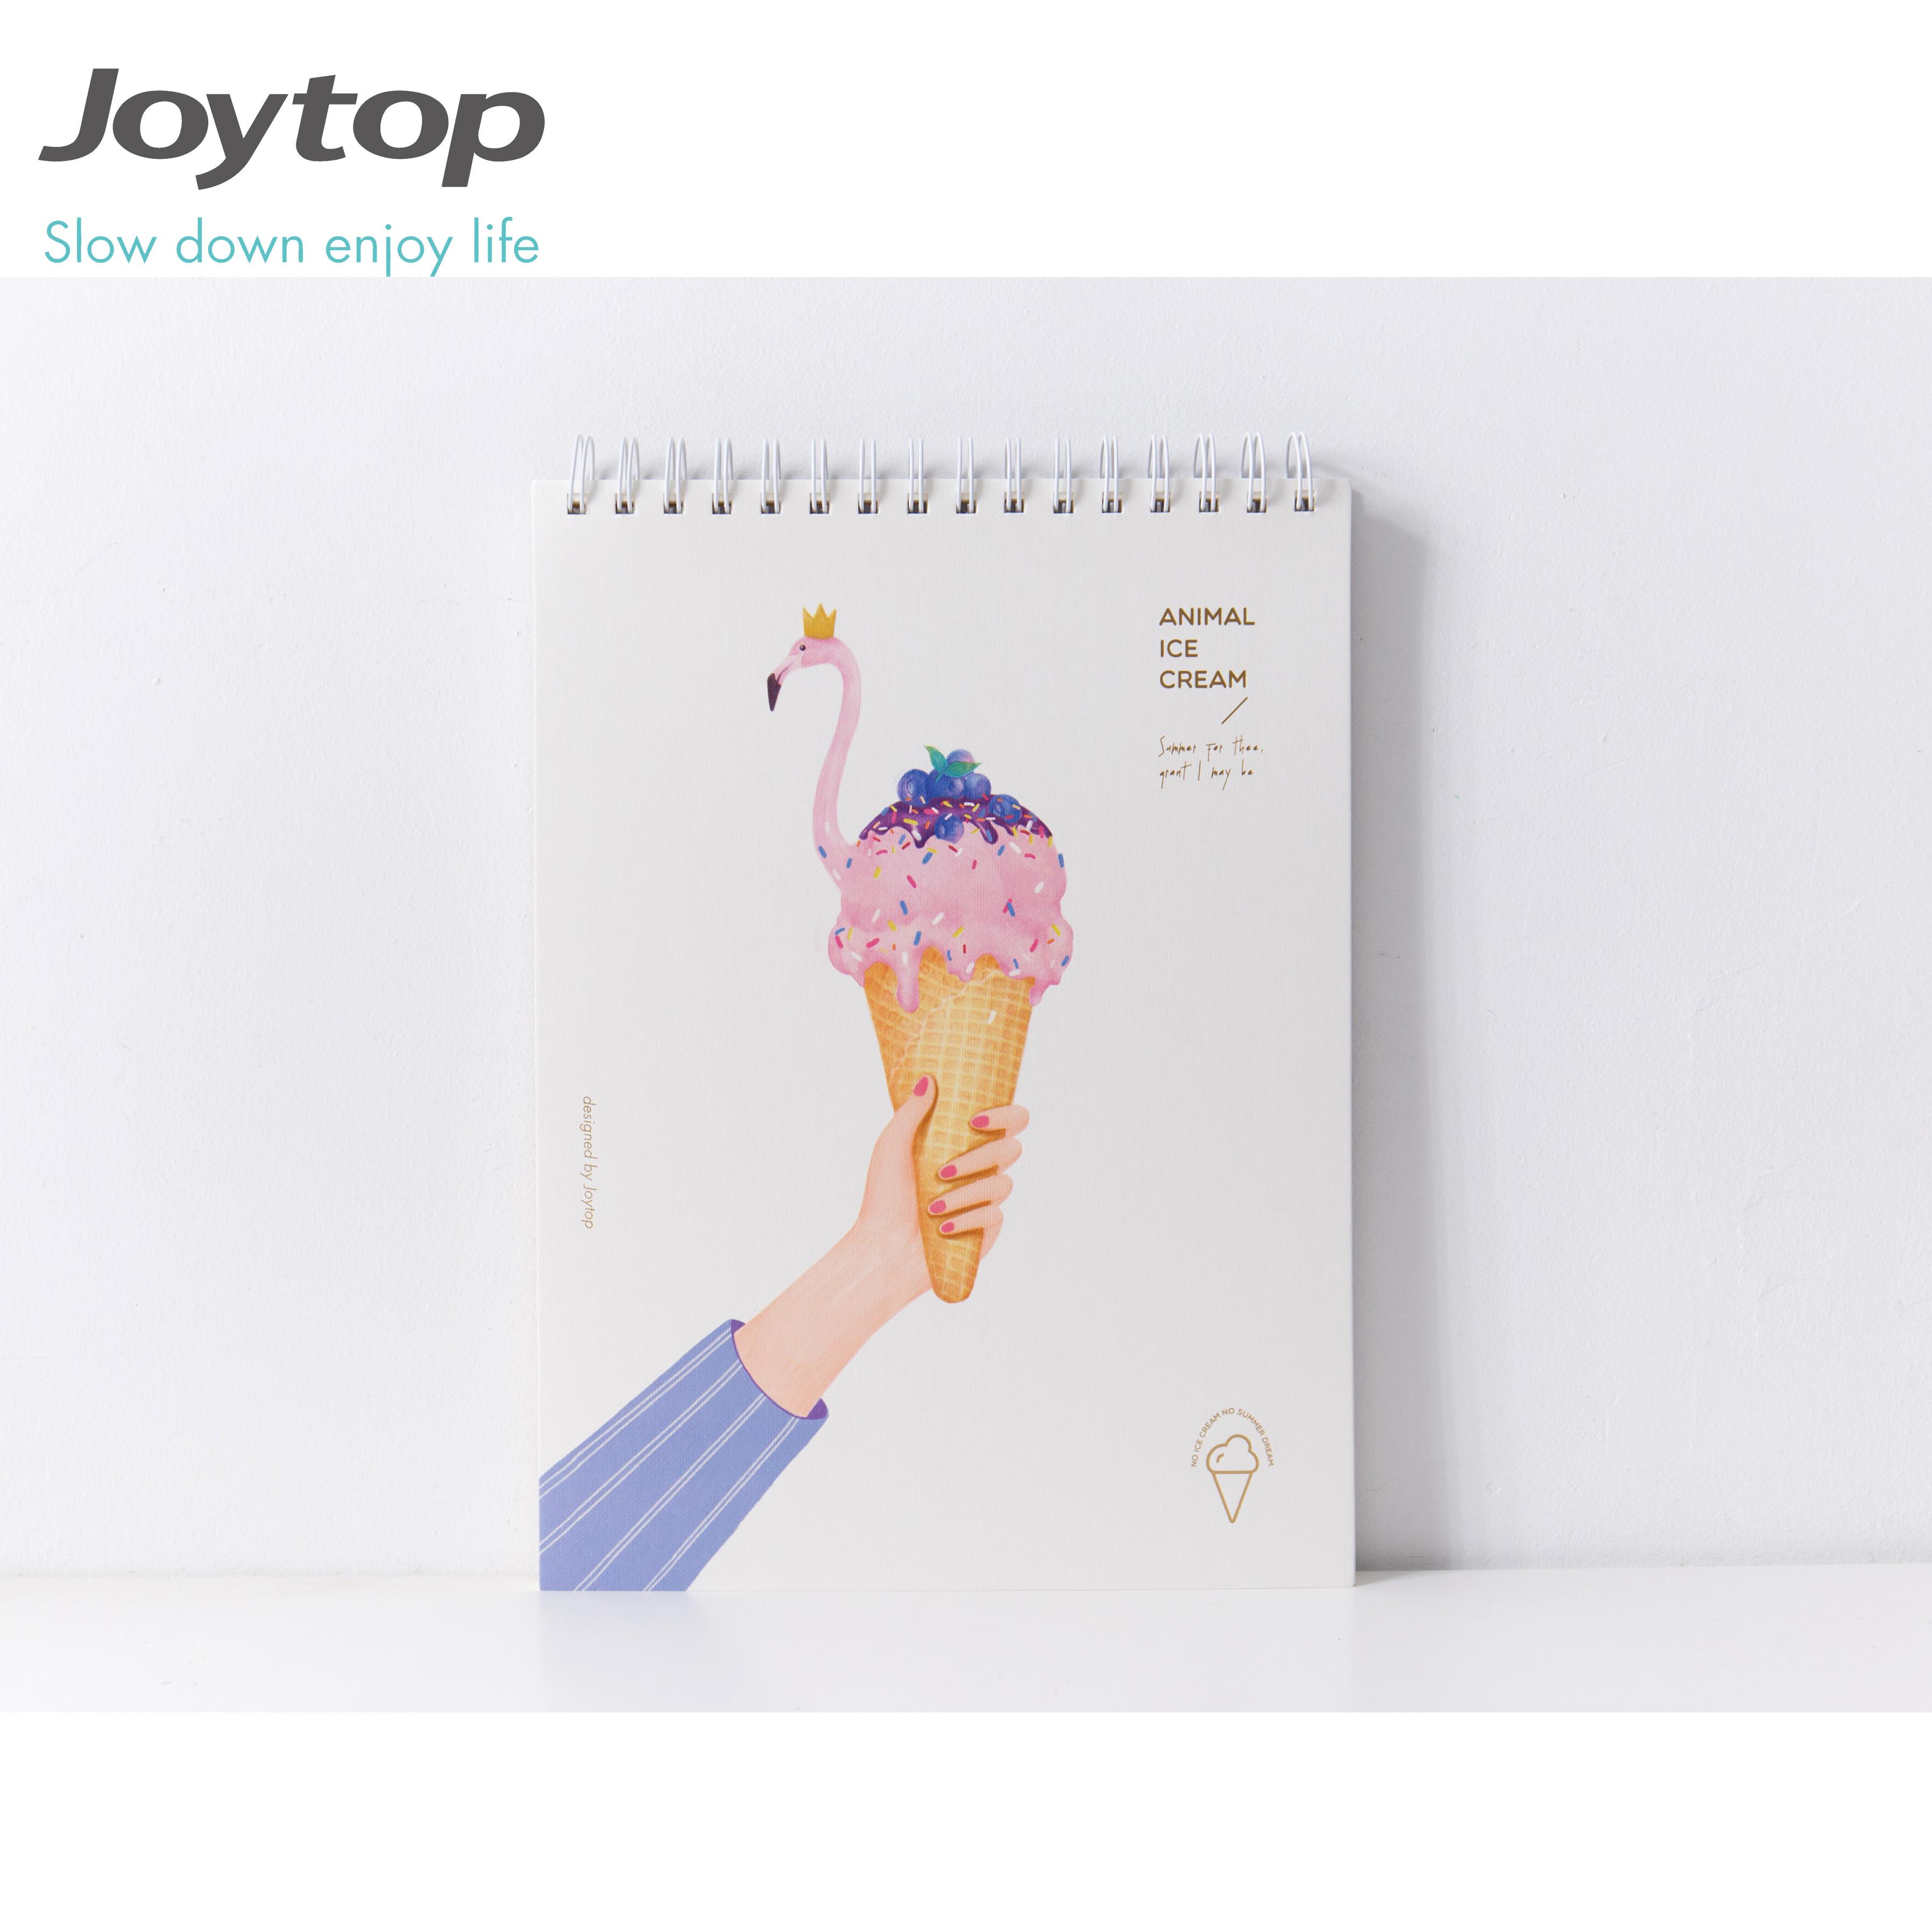 Joytop الحيوان الآيس كريم كتاب رسم B5 دفتر رسم 7961 Buy كتاب رسم دفتر رسم كتاب الصور Product On Alibaba Com